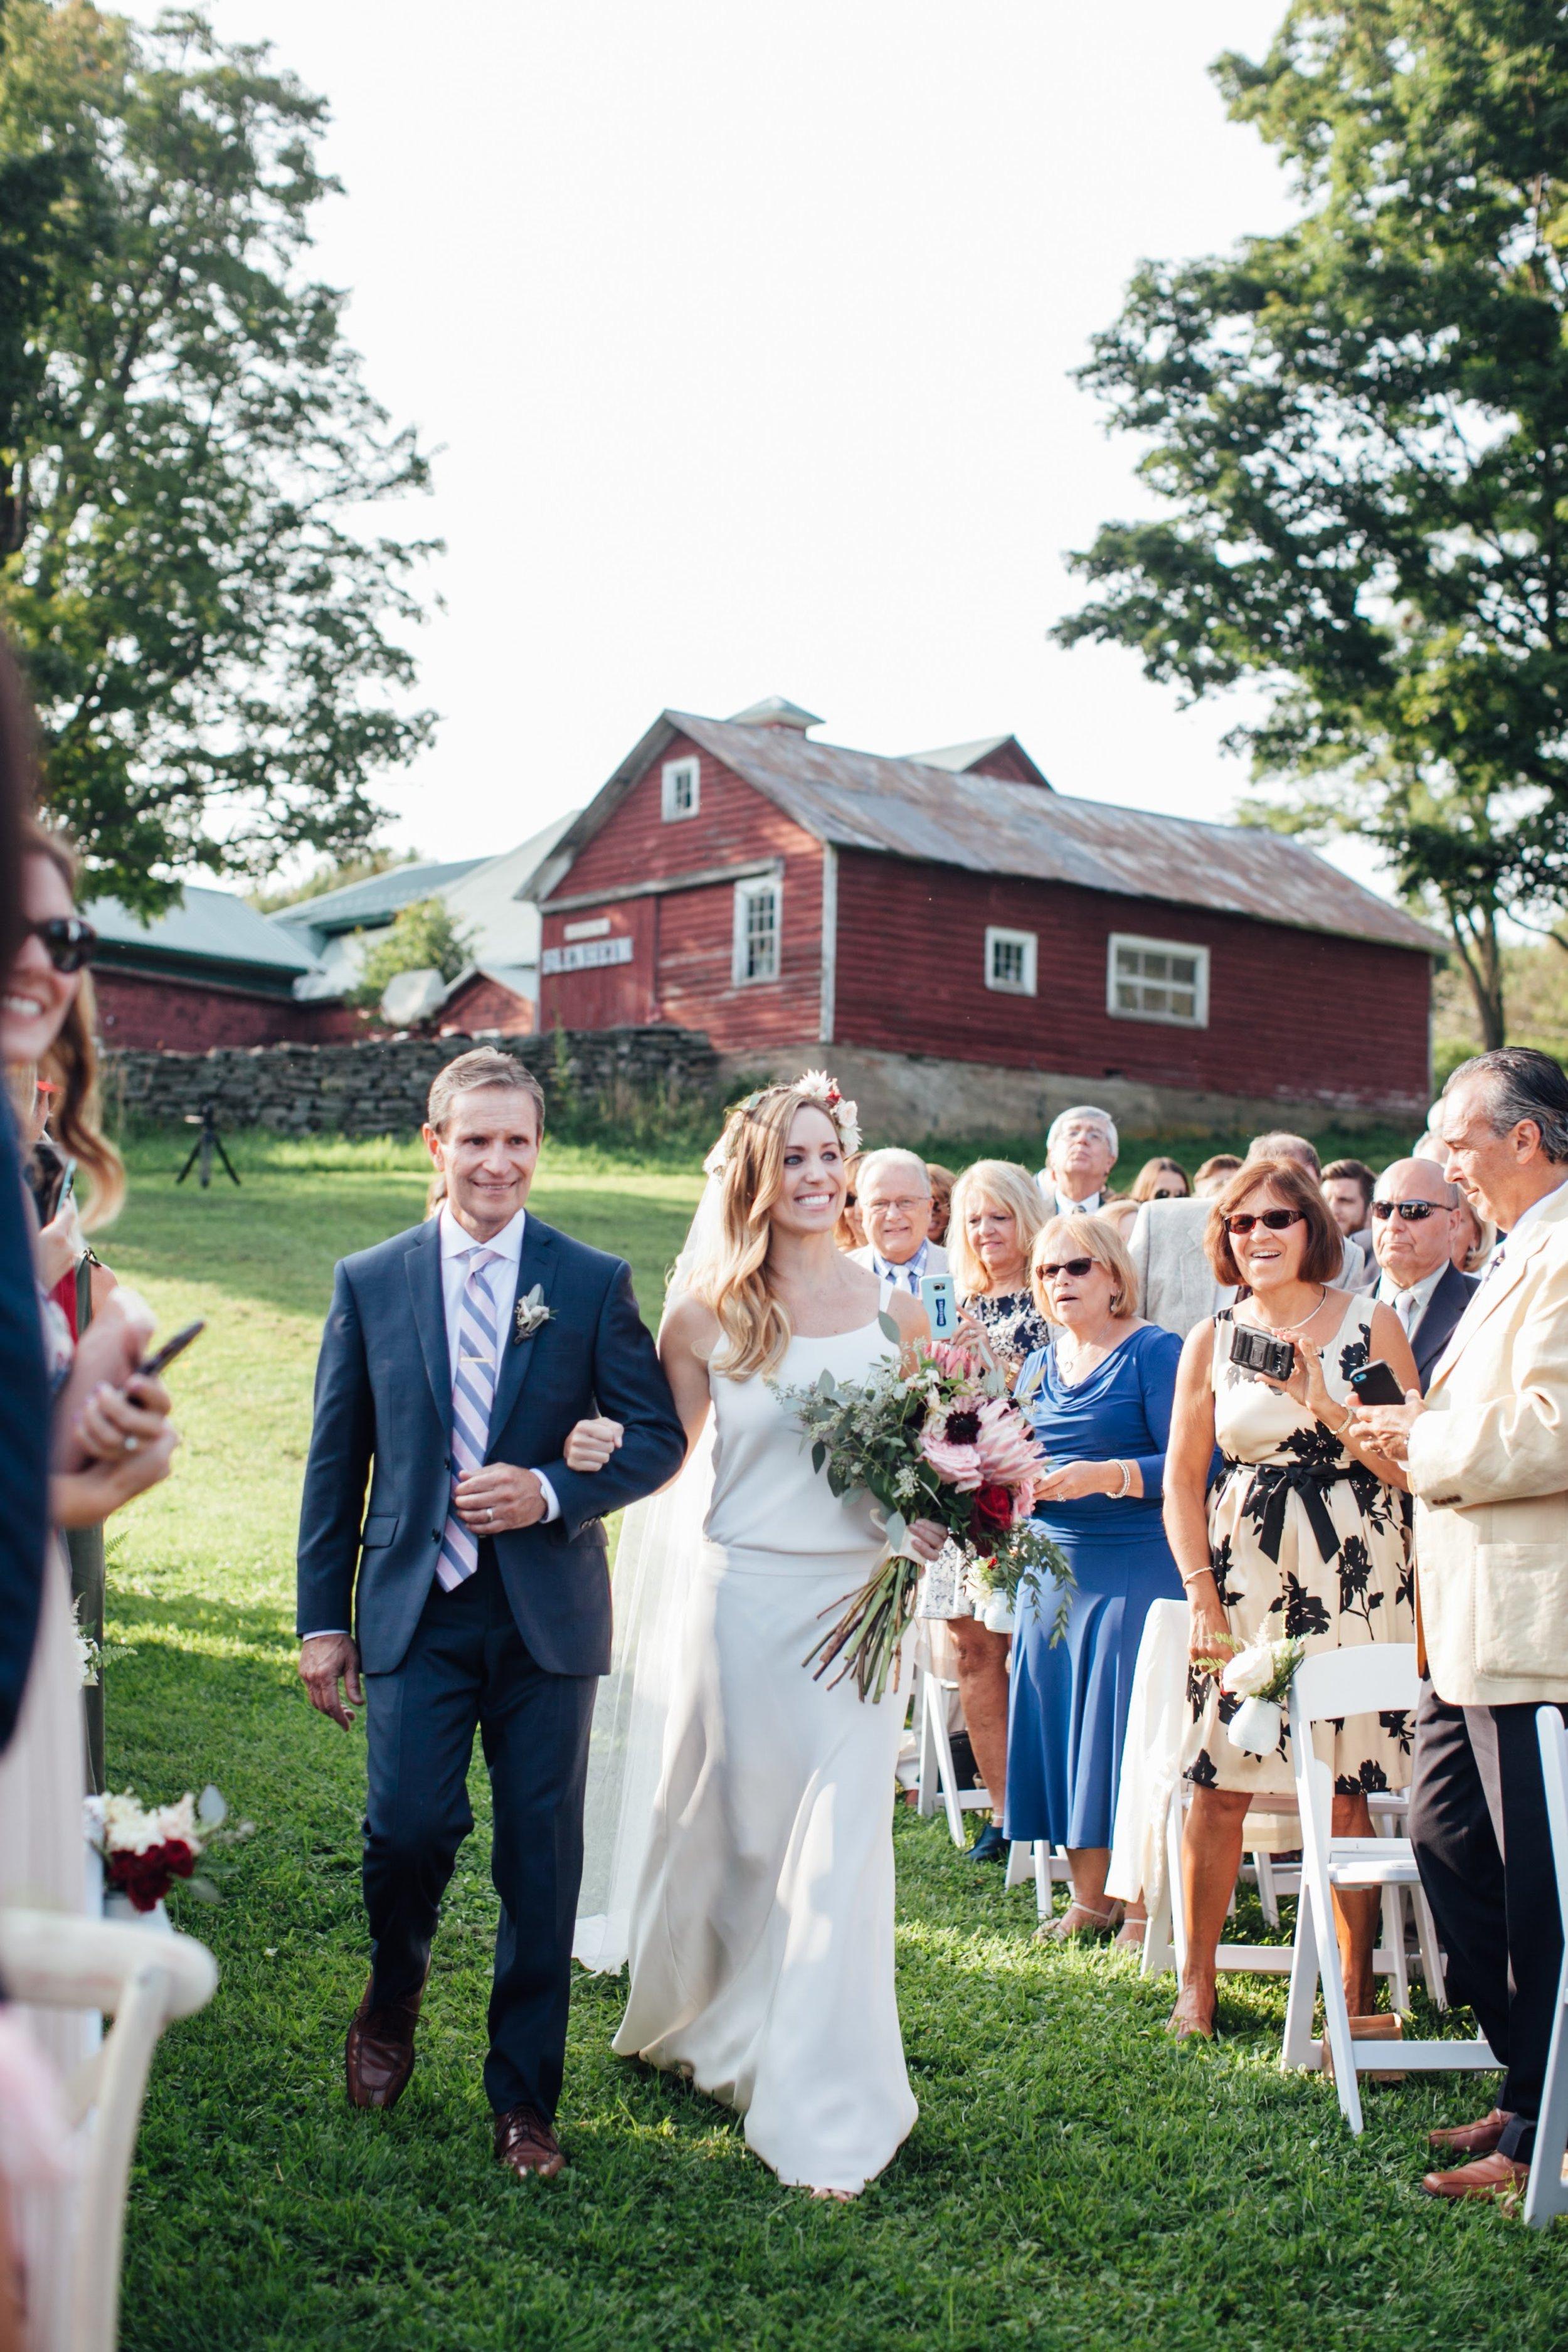 Courtney + Matt Blenheim Hill Farm Catskills NY Wedding Veronica Lola Photography 2017-375.jpg